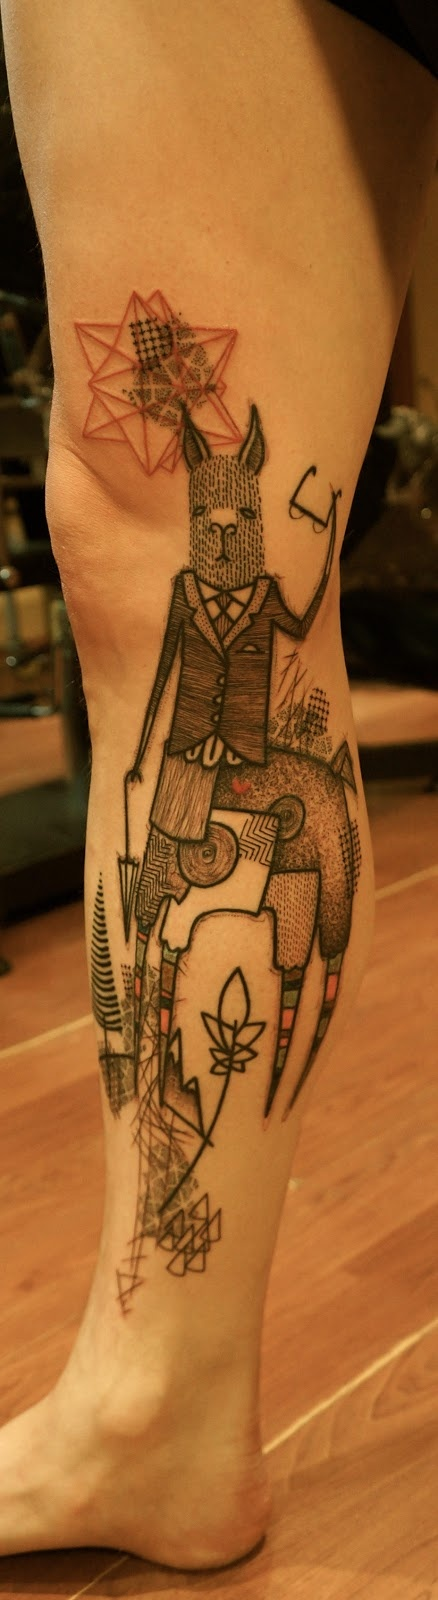 Lauren Mmmmmmm's husband Eric's new llama tattoo by Noon